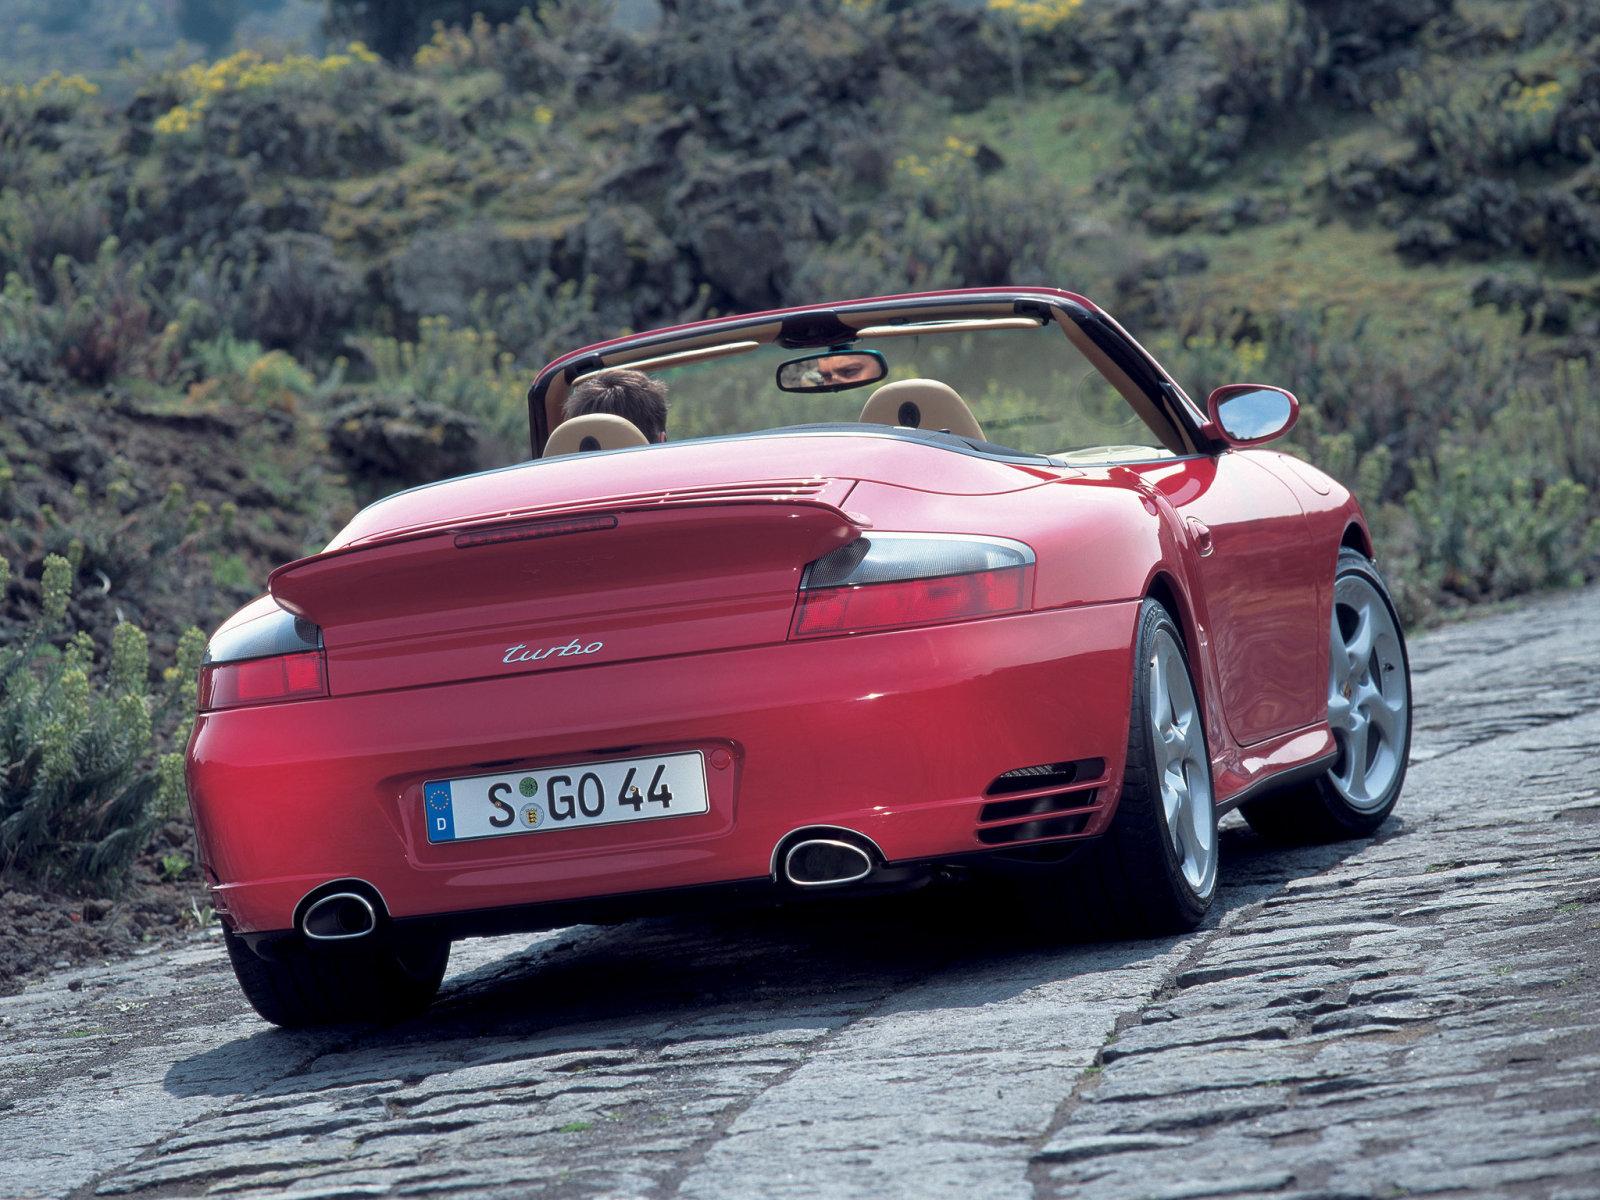 Porsche (Порше) 911 Carrera 2001-2006 г.